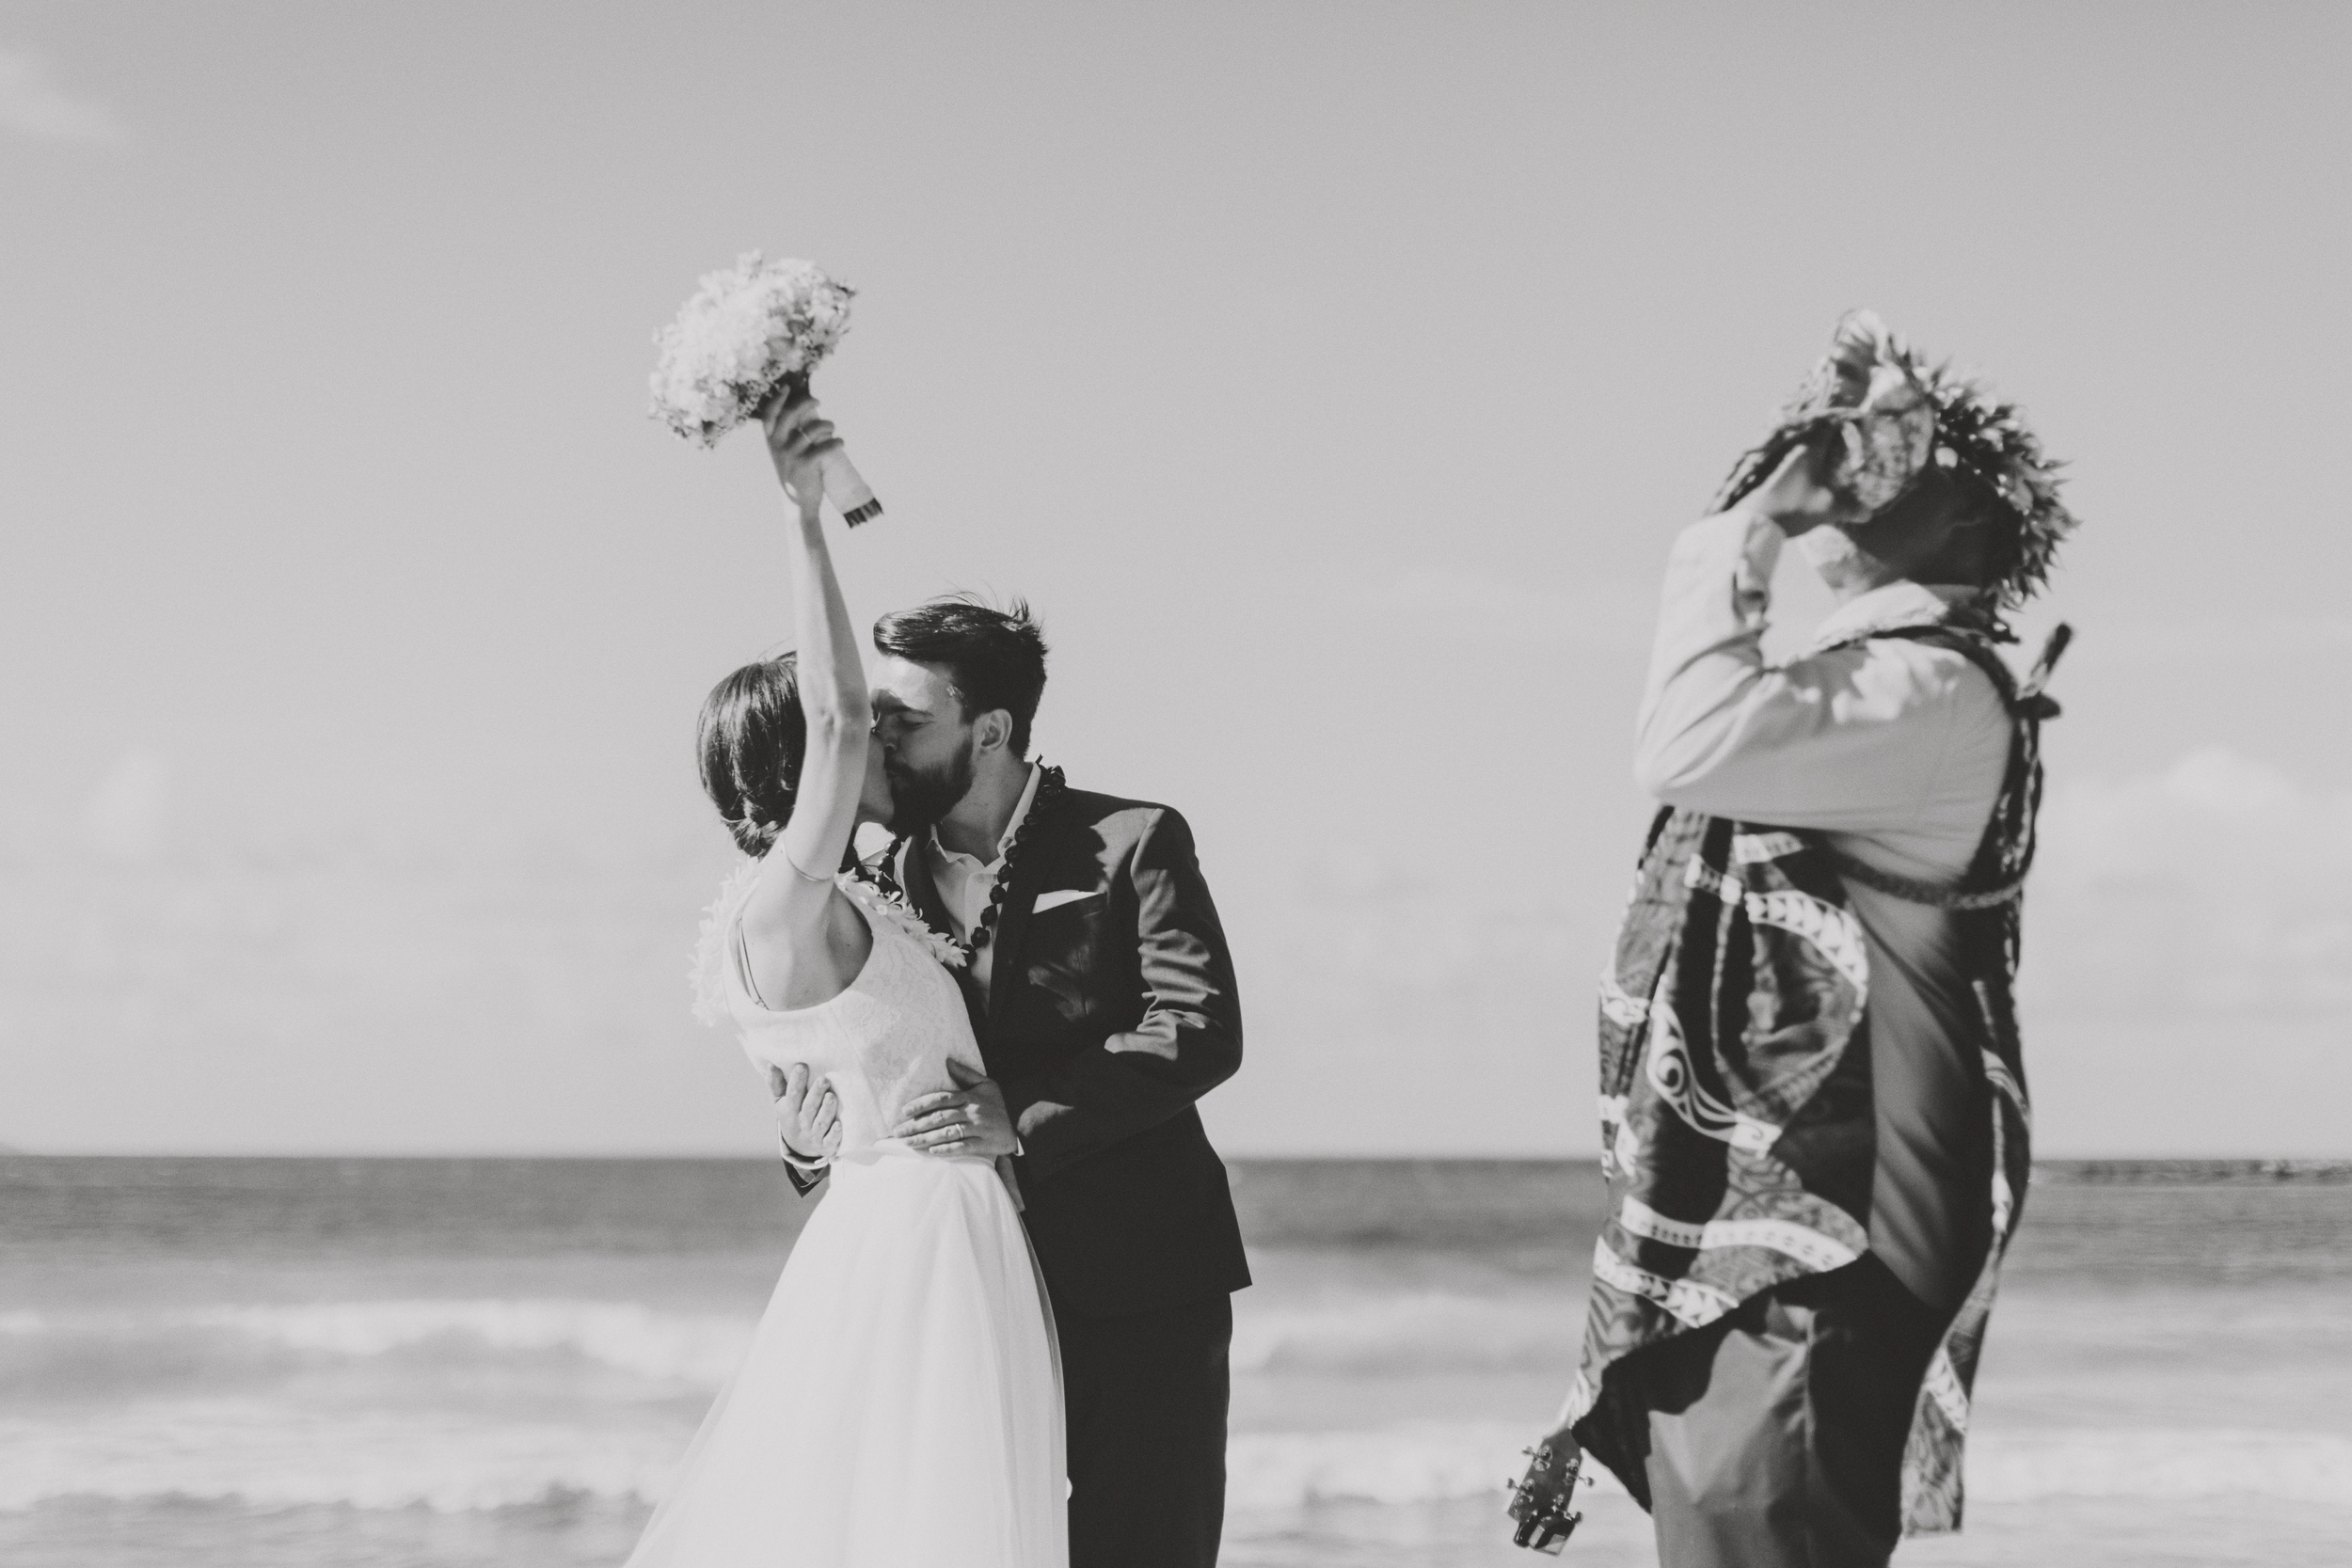 angie-diaz-photography-maui-wedding-ironwoods-beach-22.jpg